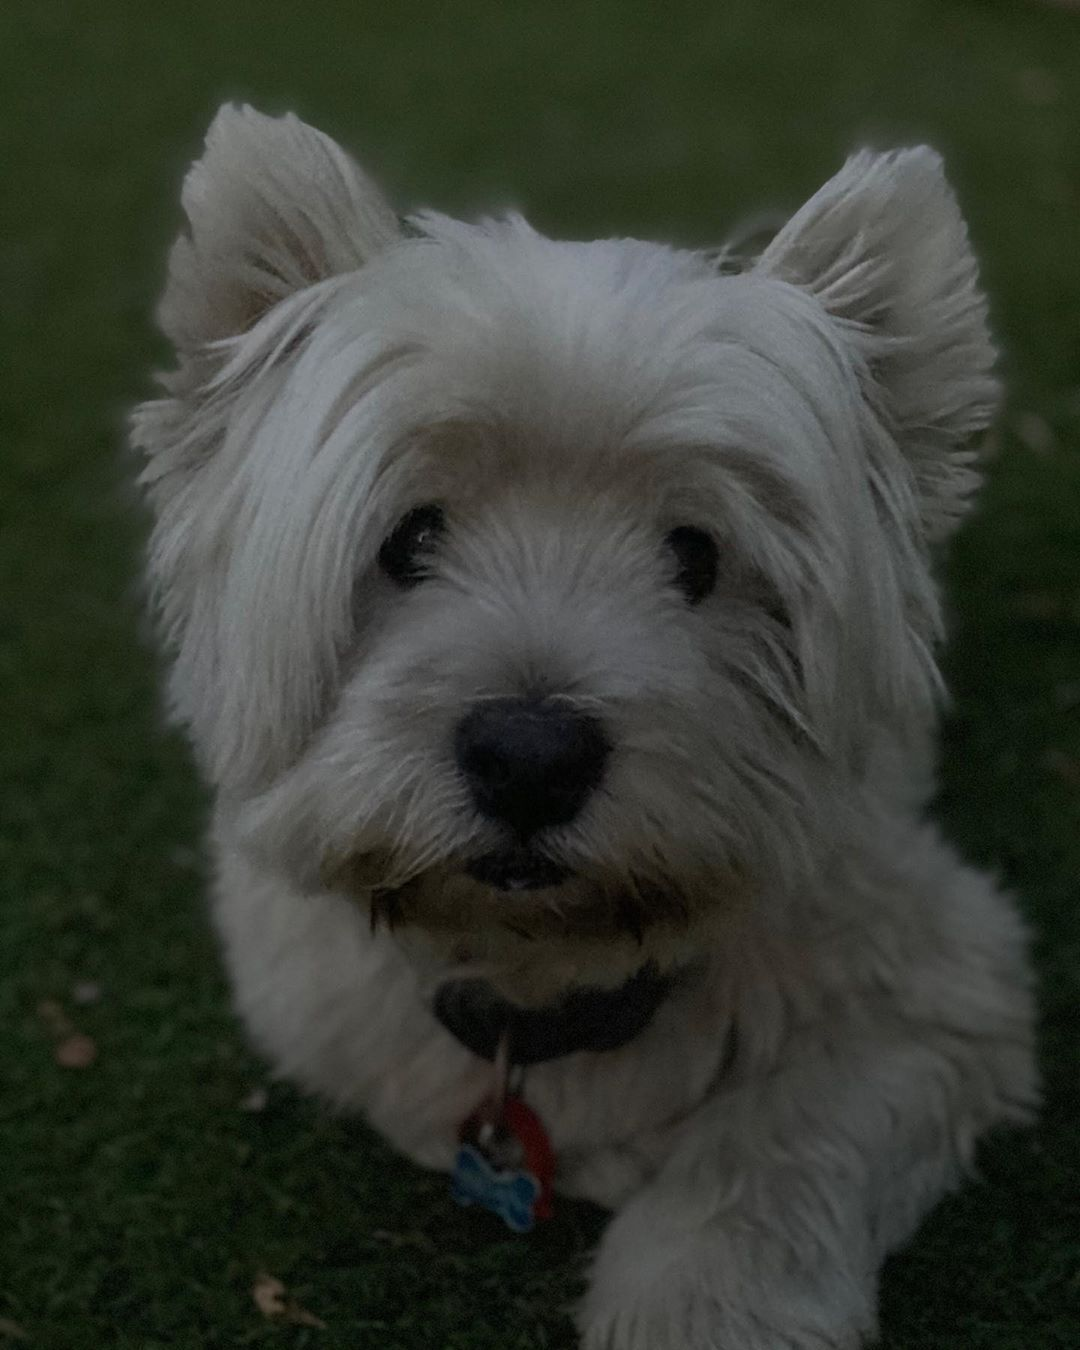 "𝐁 𝐑 𝐈 𝐀 𝐍 on Instagram: ""im pretty cool 🐾 #cute #dogs #cutedogs #lovedogs #doggo"""